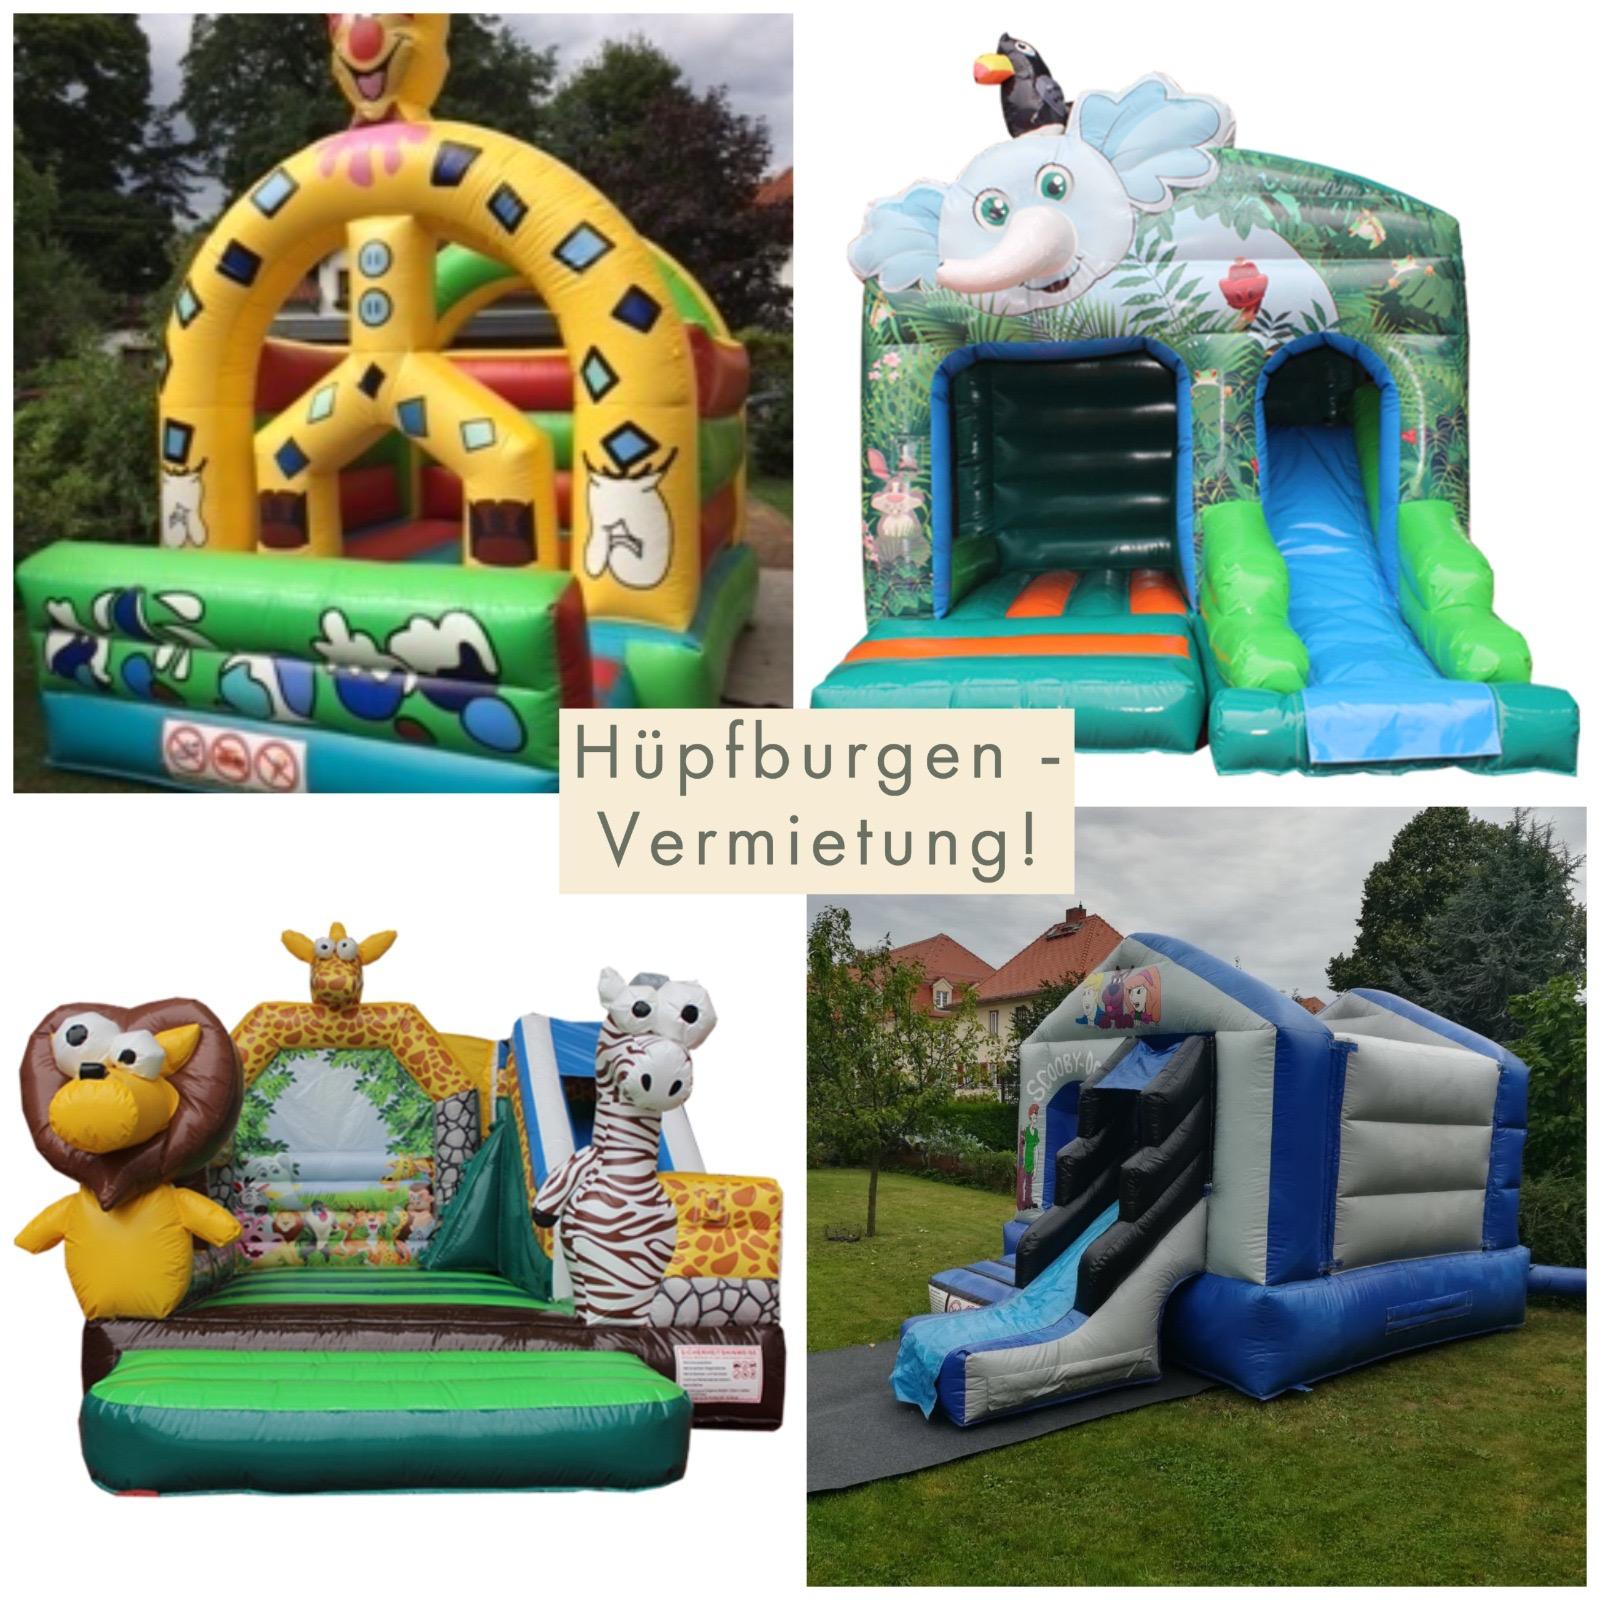 Hüpfburg Hüpfburgen Kinder Spaß springen mieten verleih